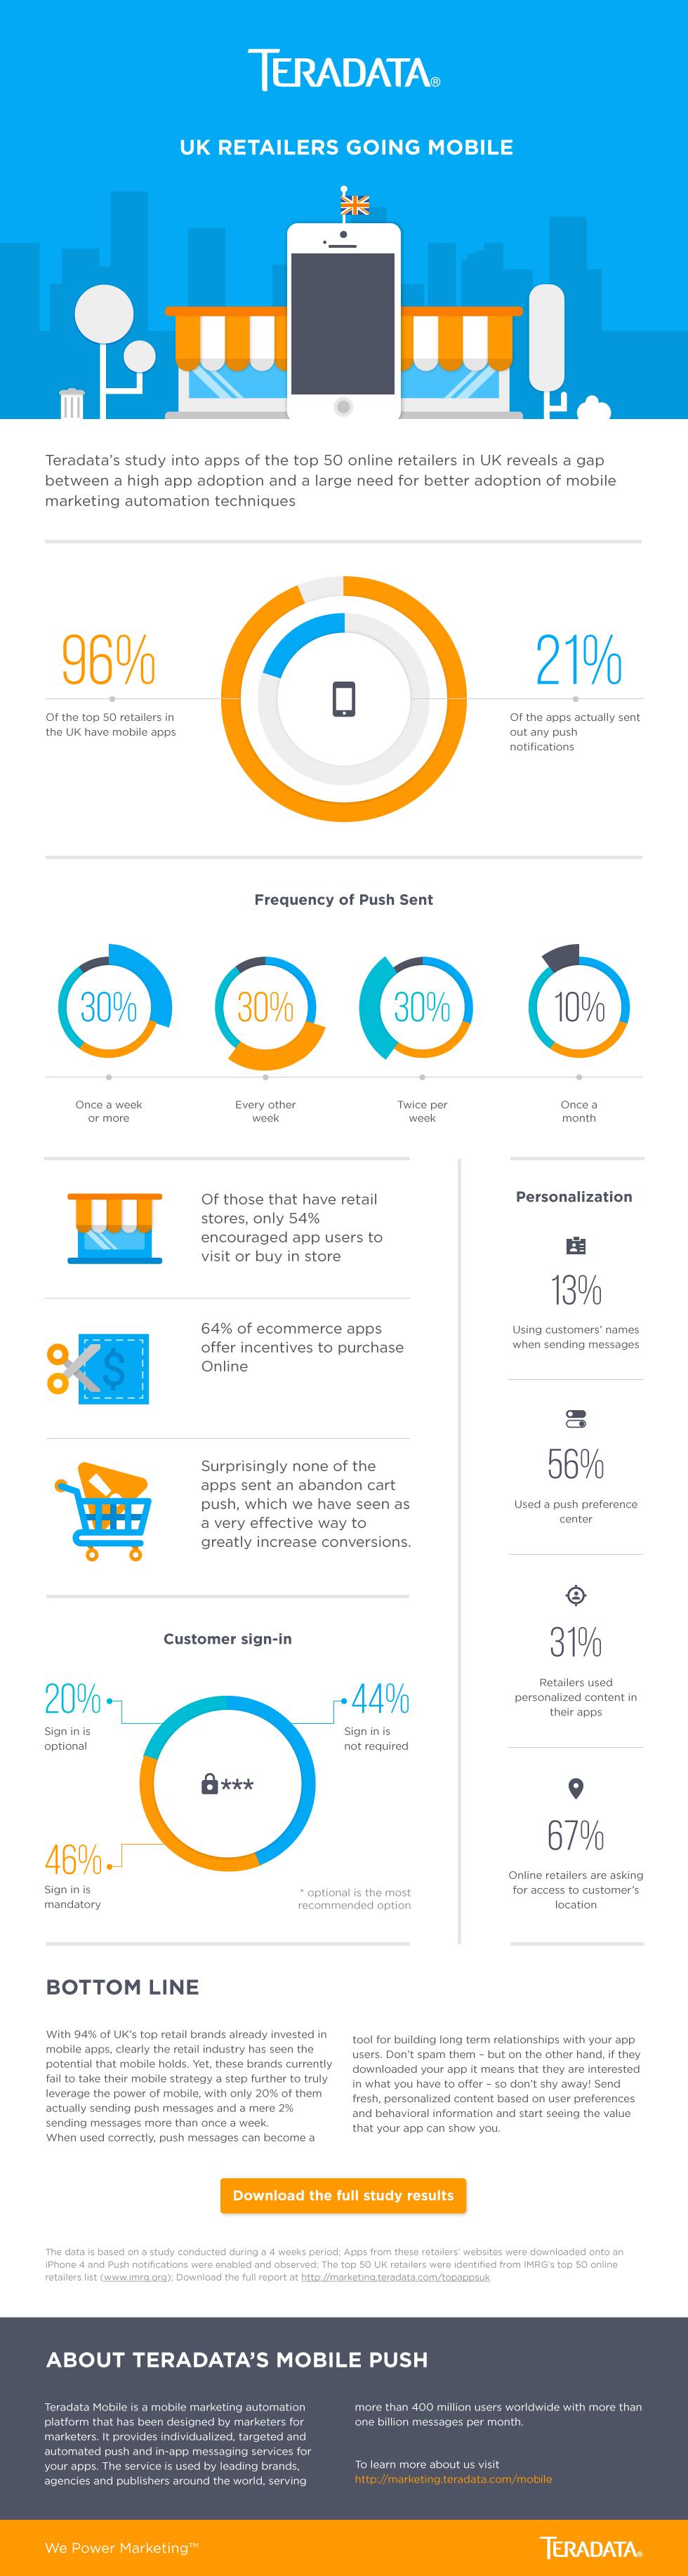 Teradata infographic